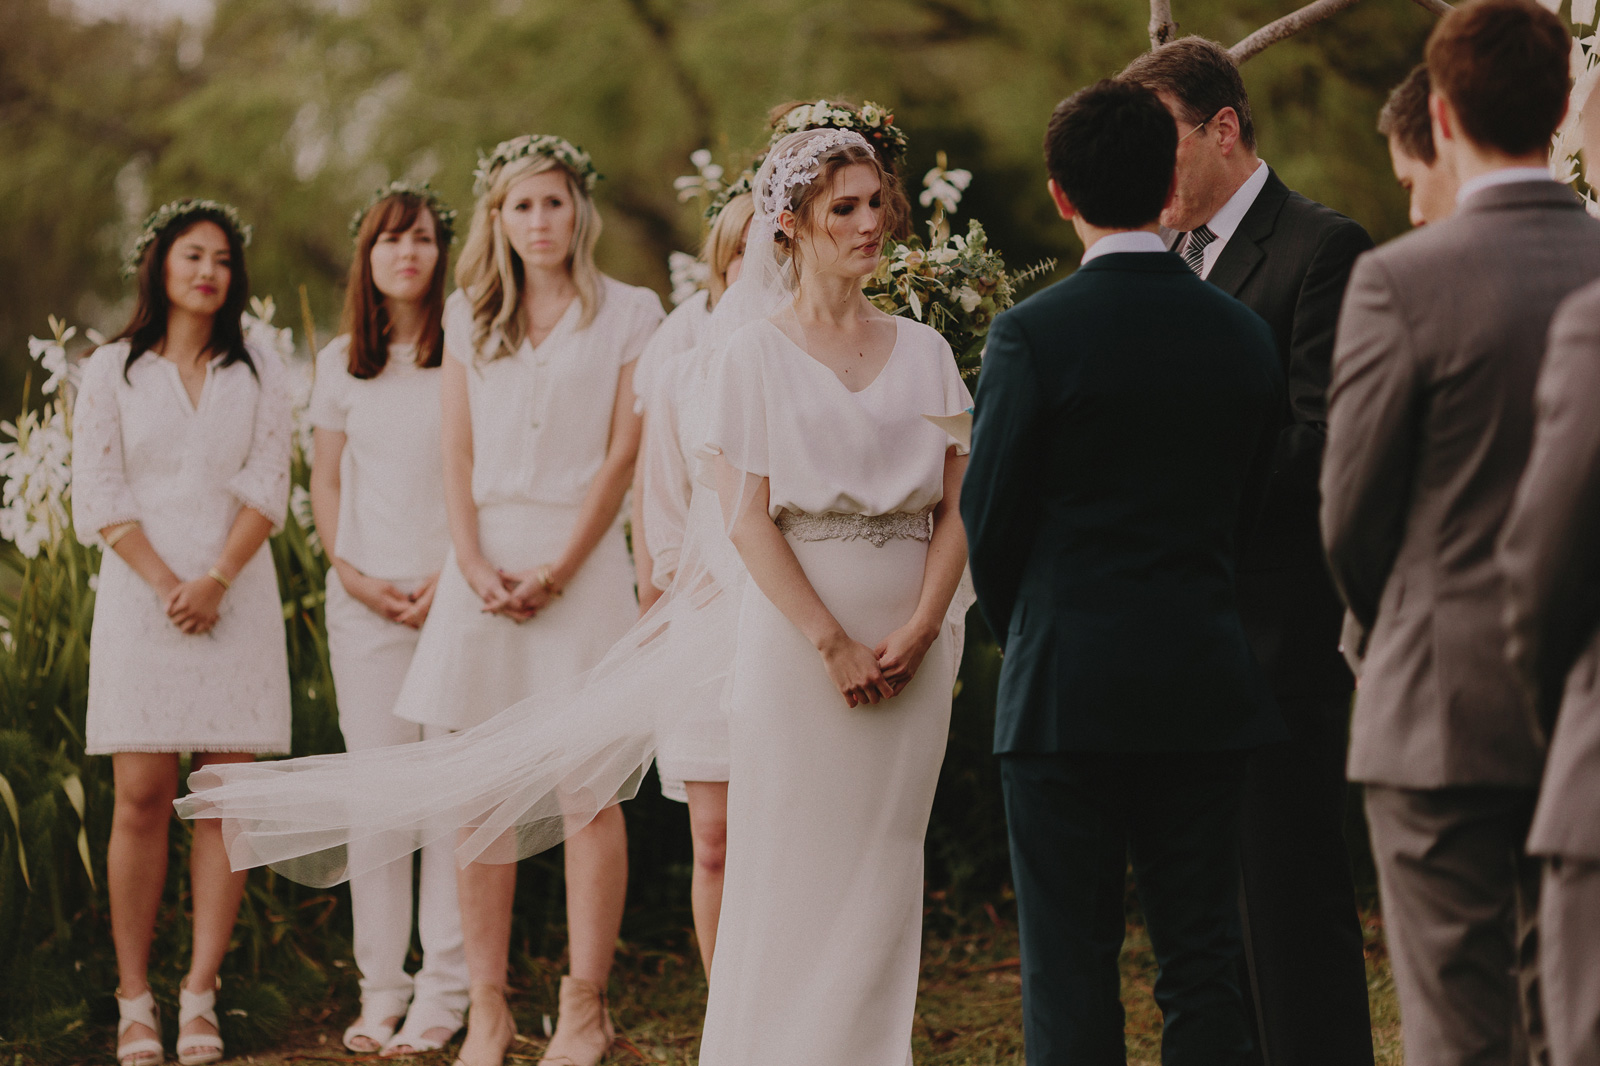 trish-lee-blouson-wedding-dress-1.jpg